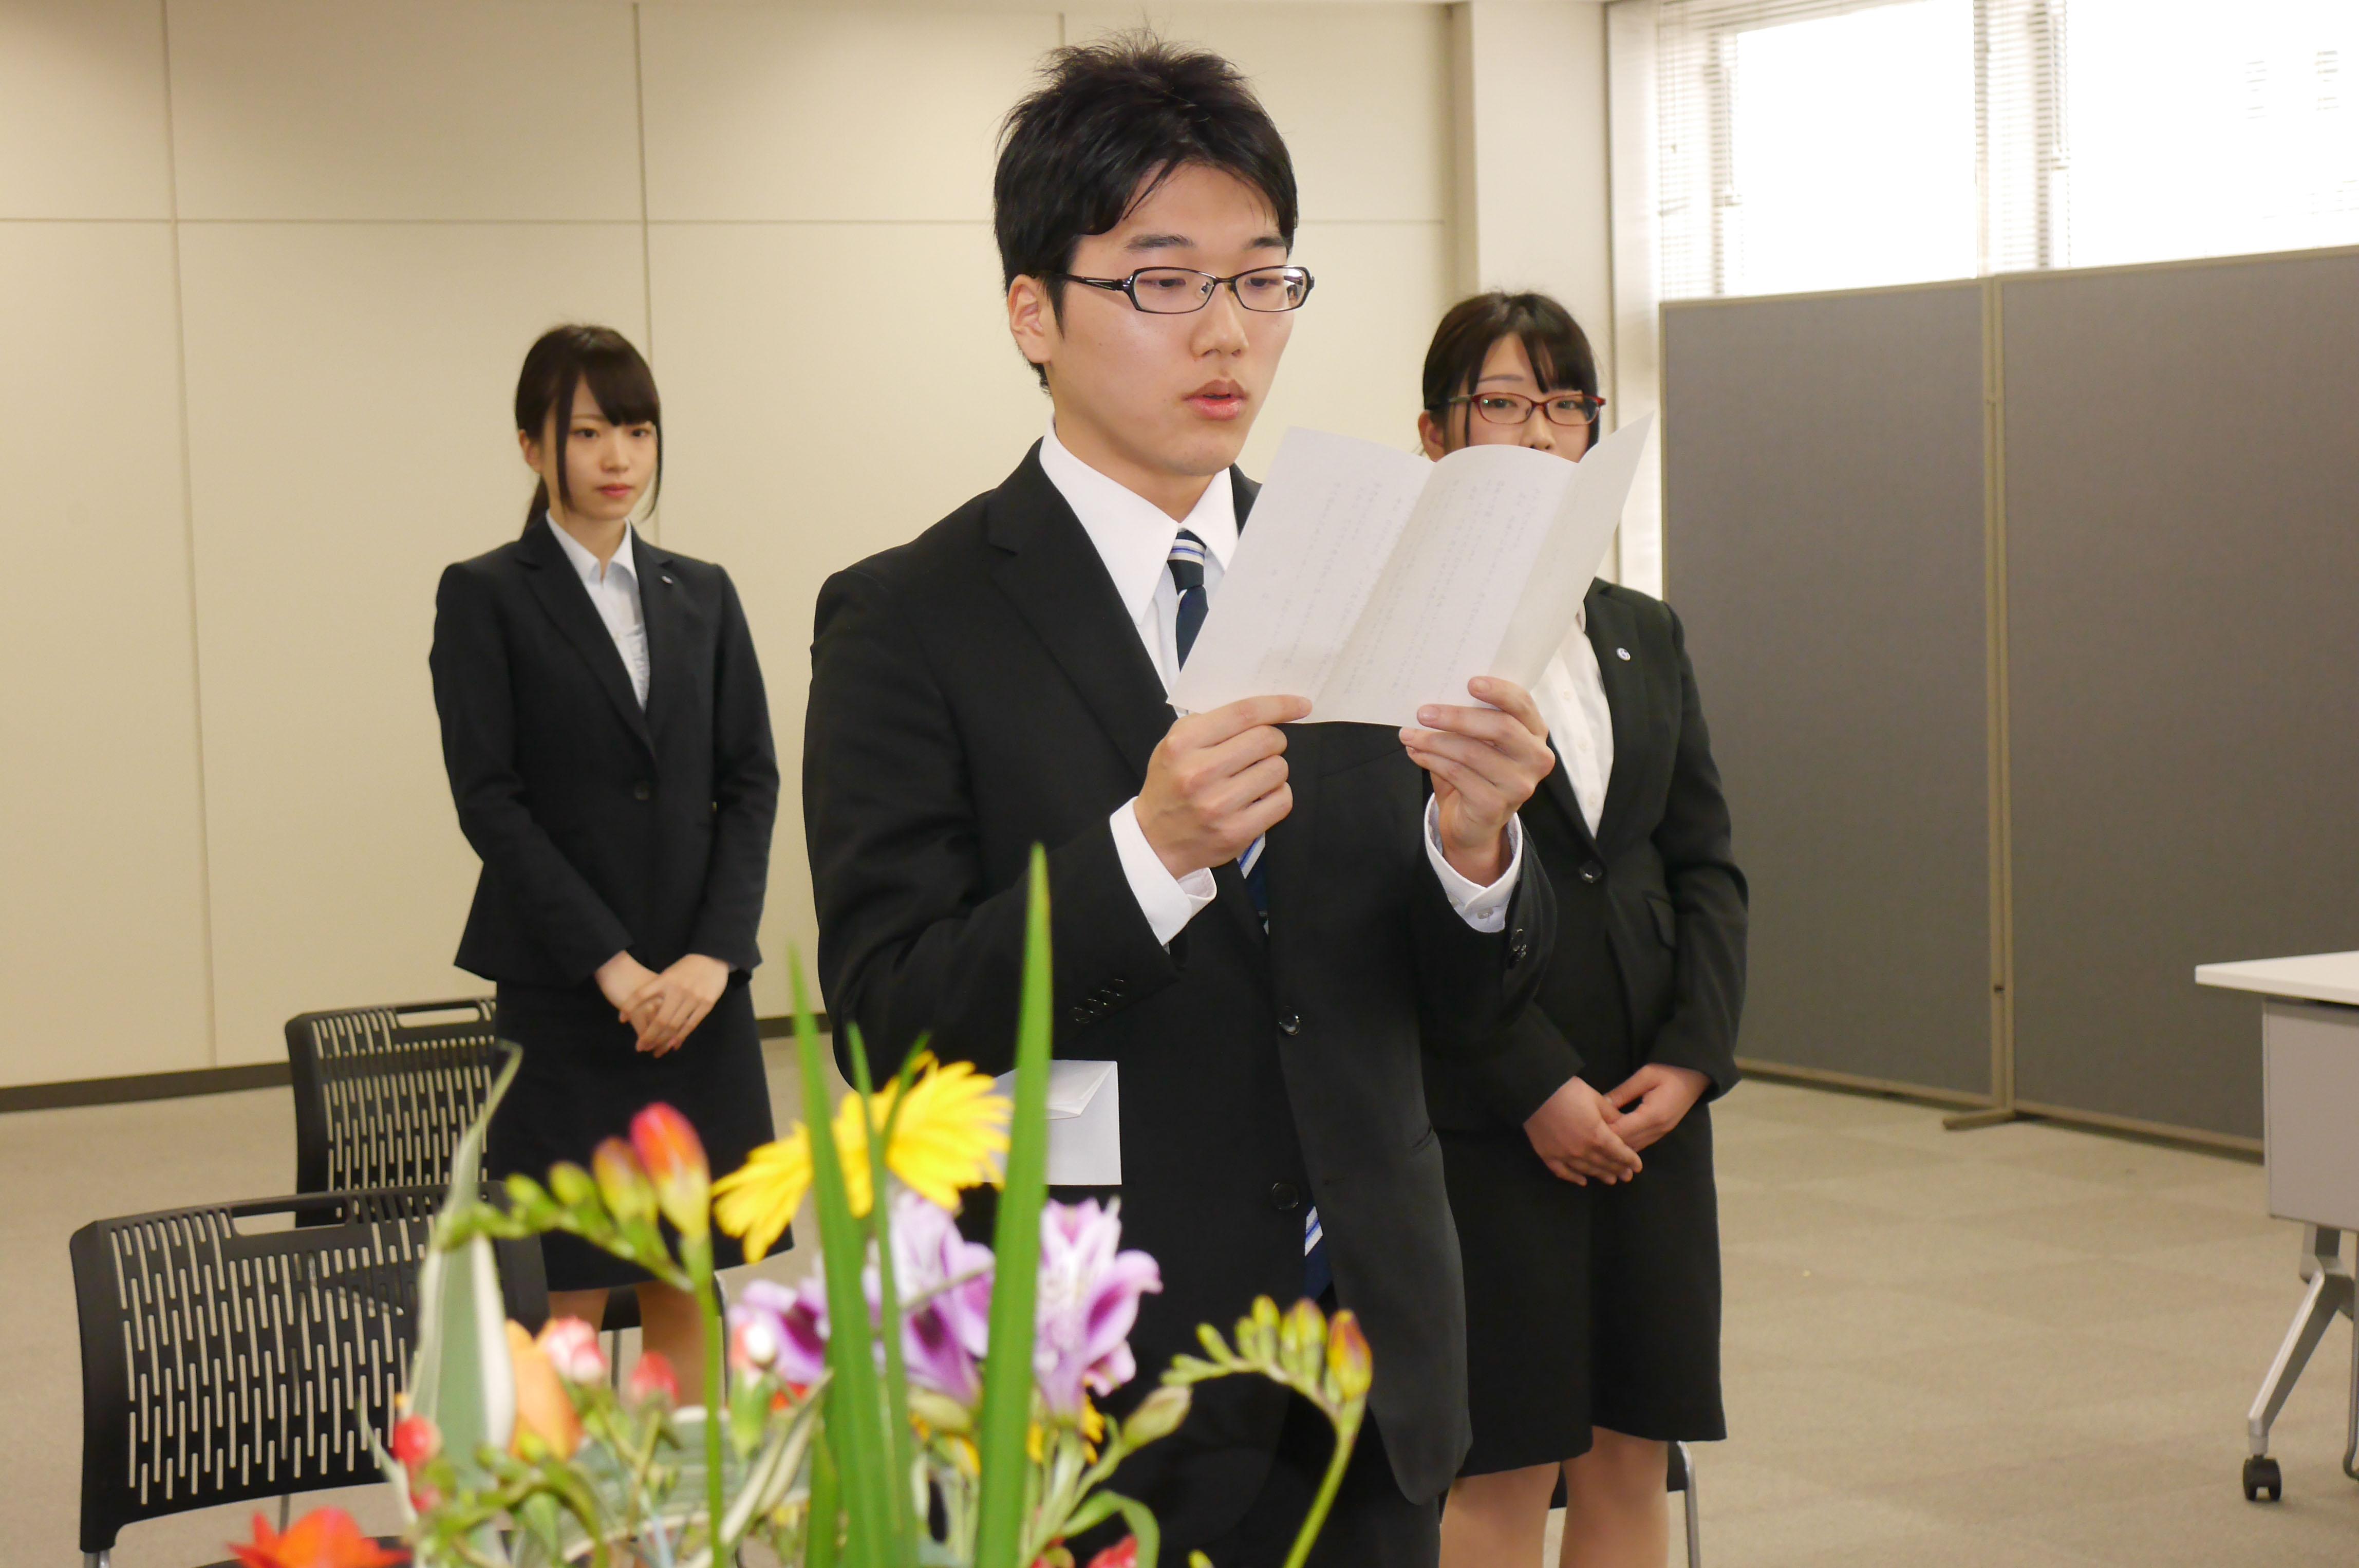 平成28年 入社式!!の画像